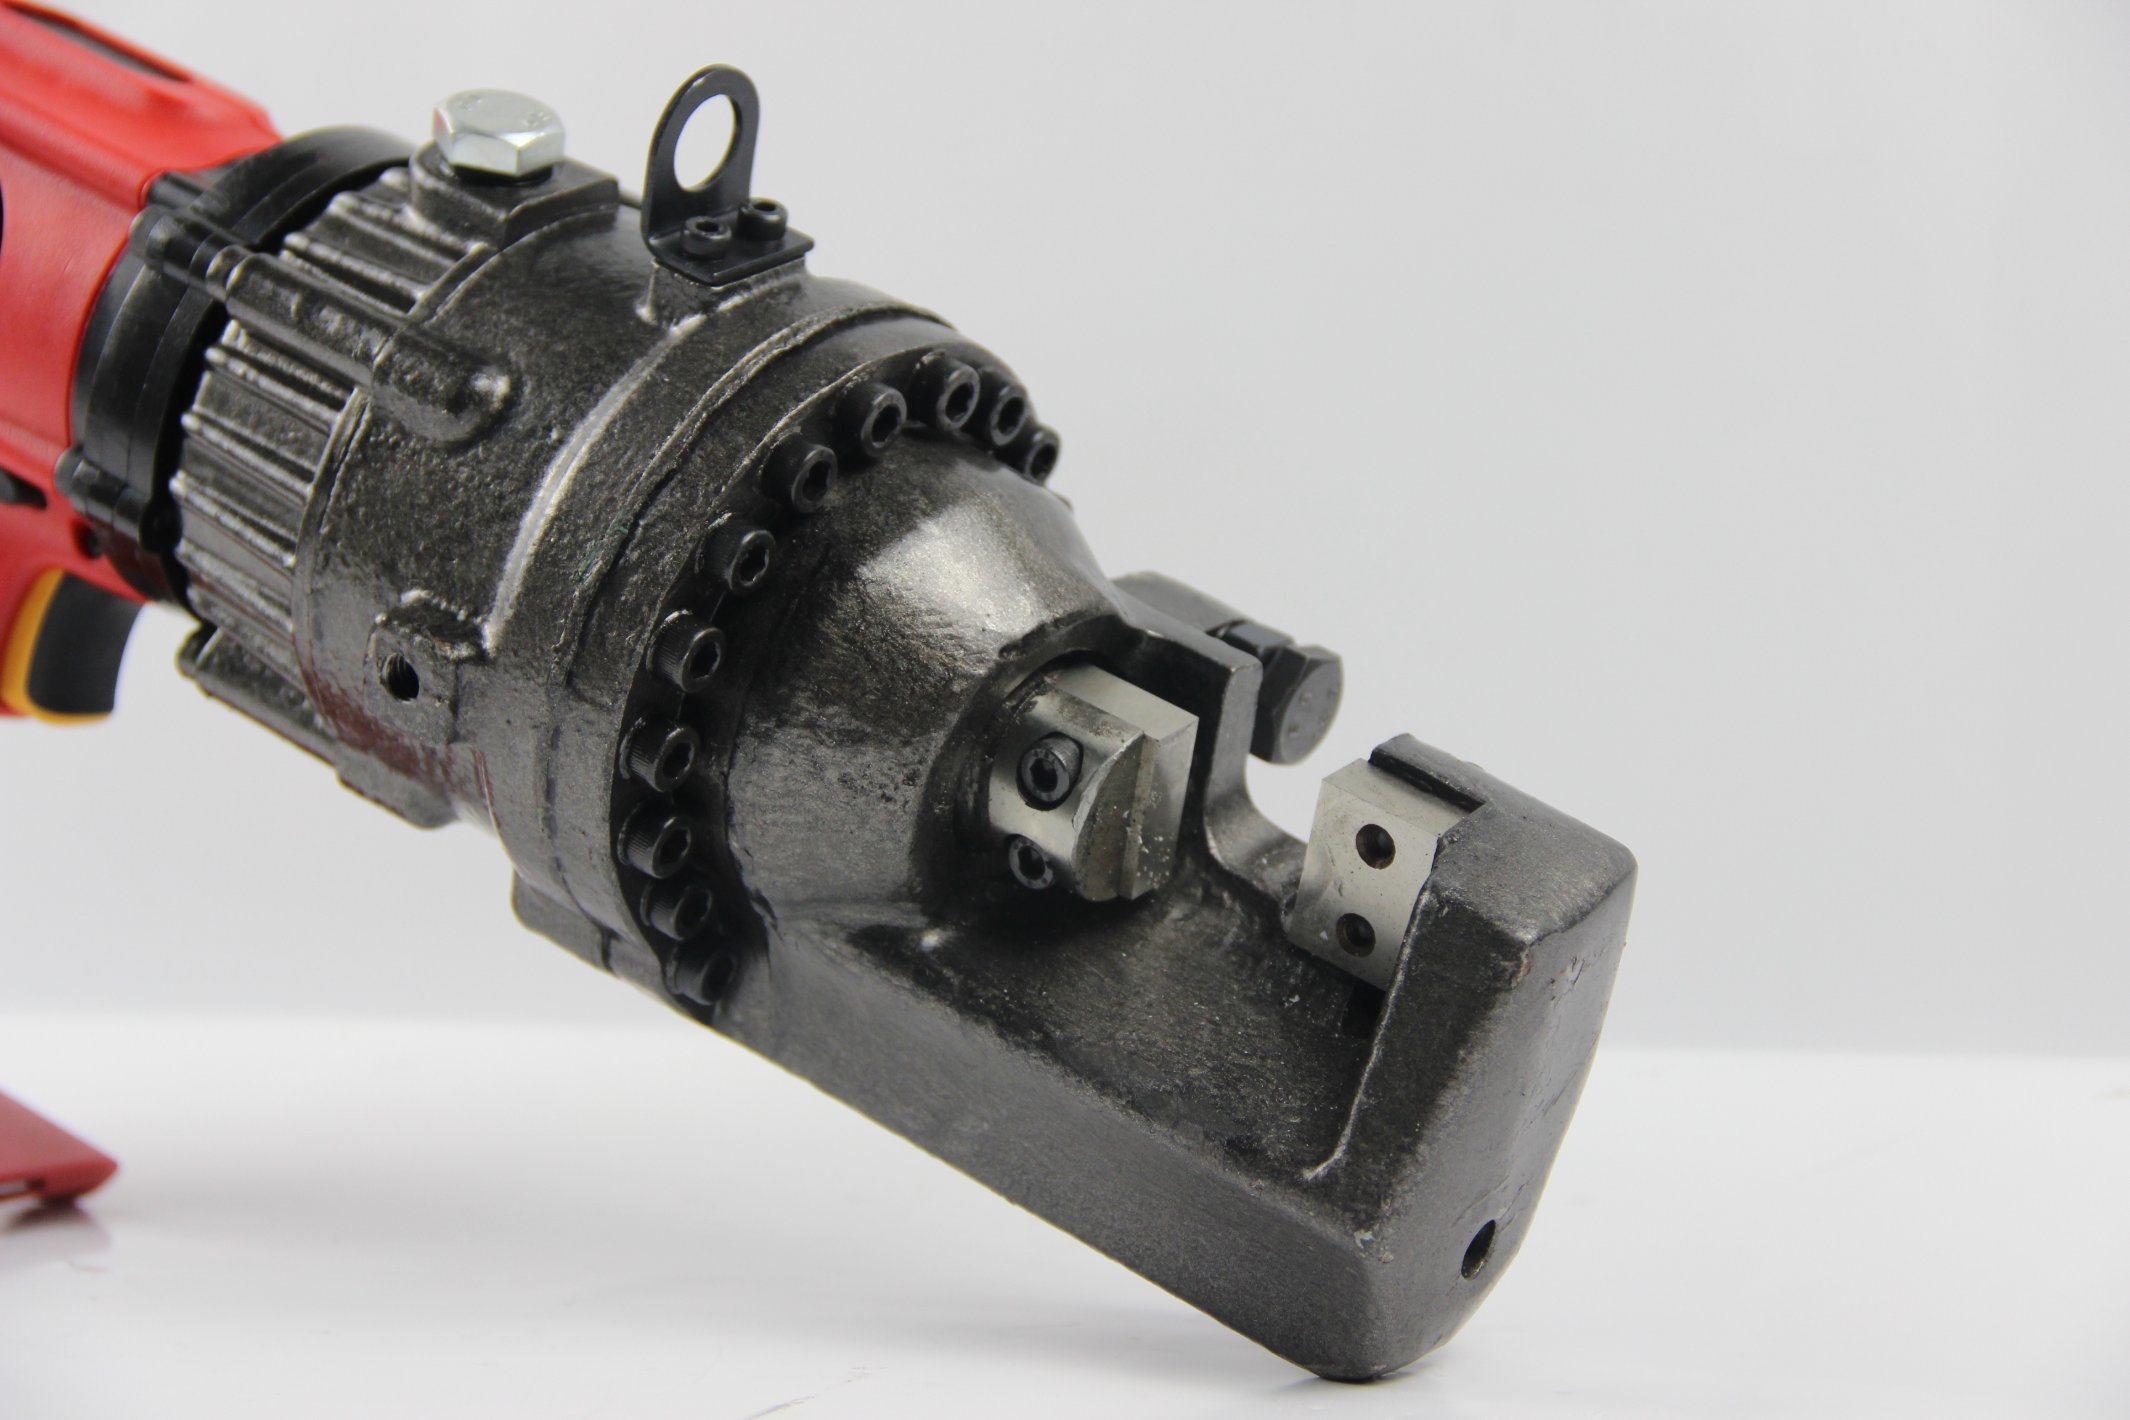 18V Blue Cordless Rebar Cutter for Rescue Rebar Cutter Be-RC-16b